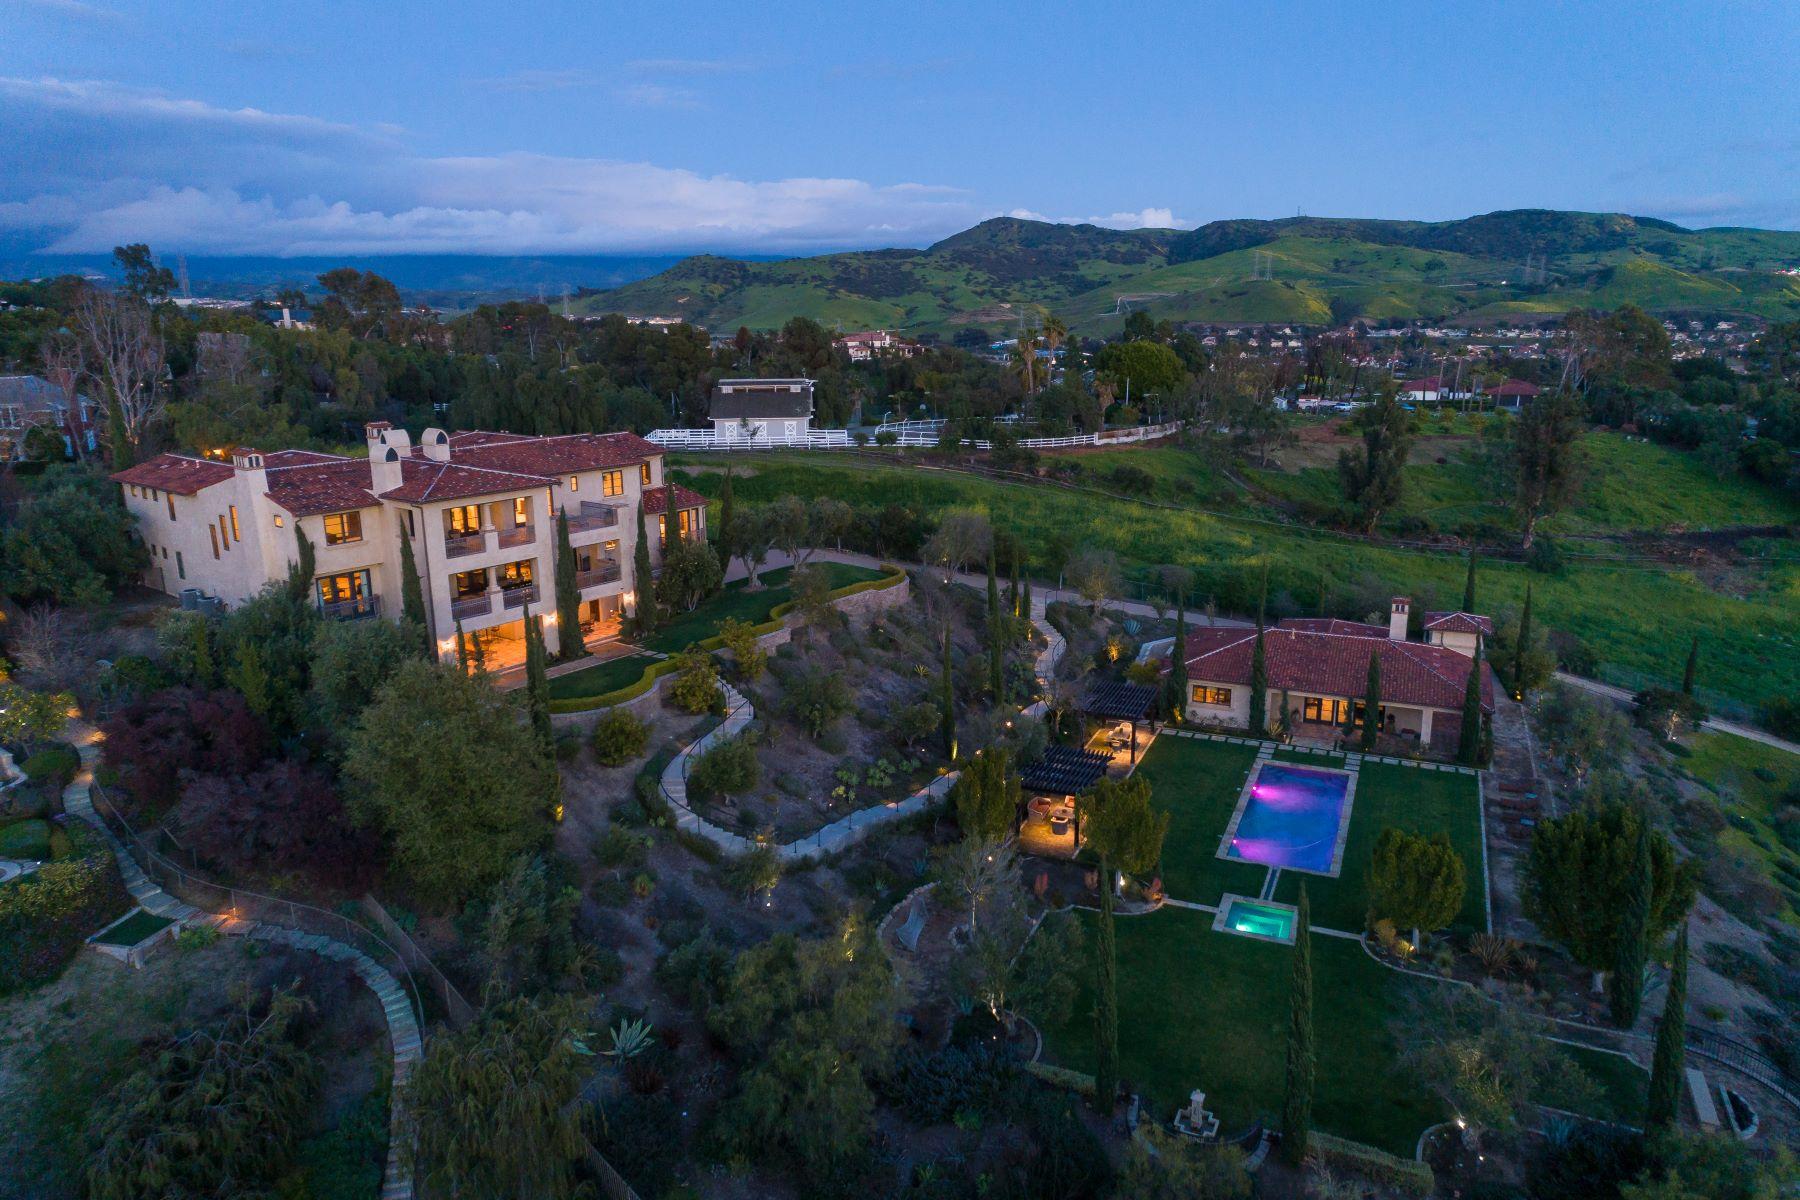 Single Family Homes for Sale at 30751 Fox Run Ln San Juan Capistrano, California 92675 United States